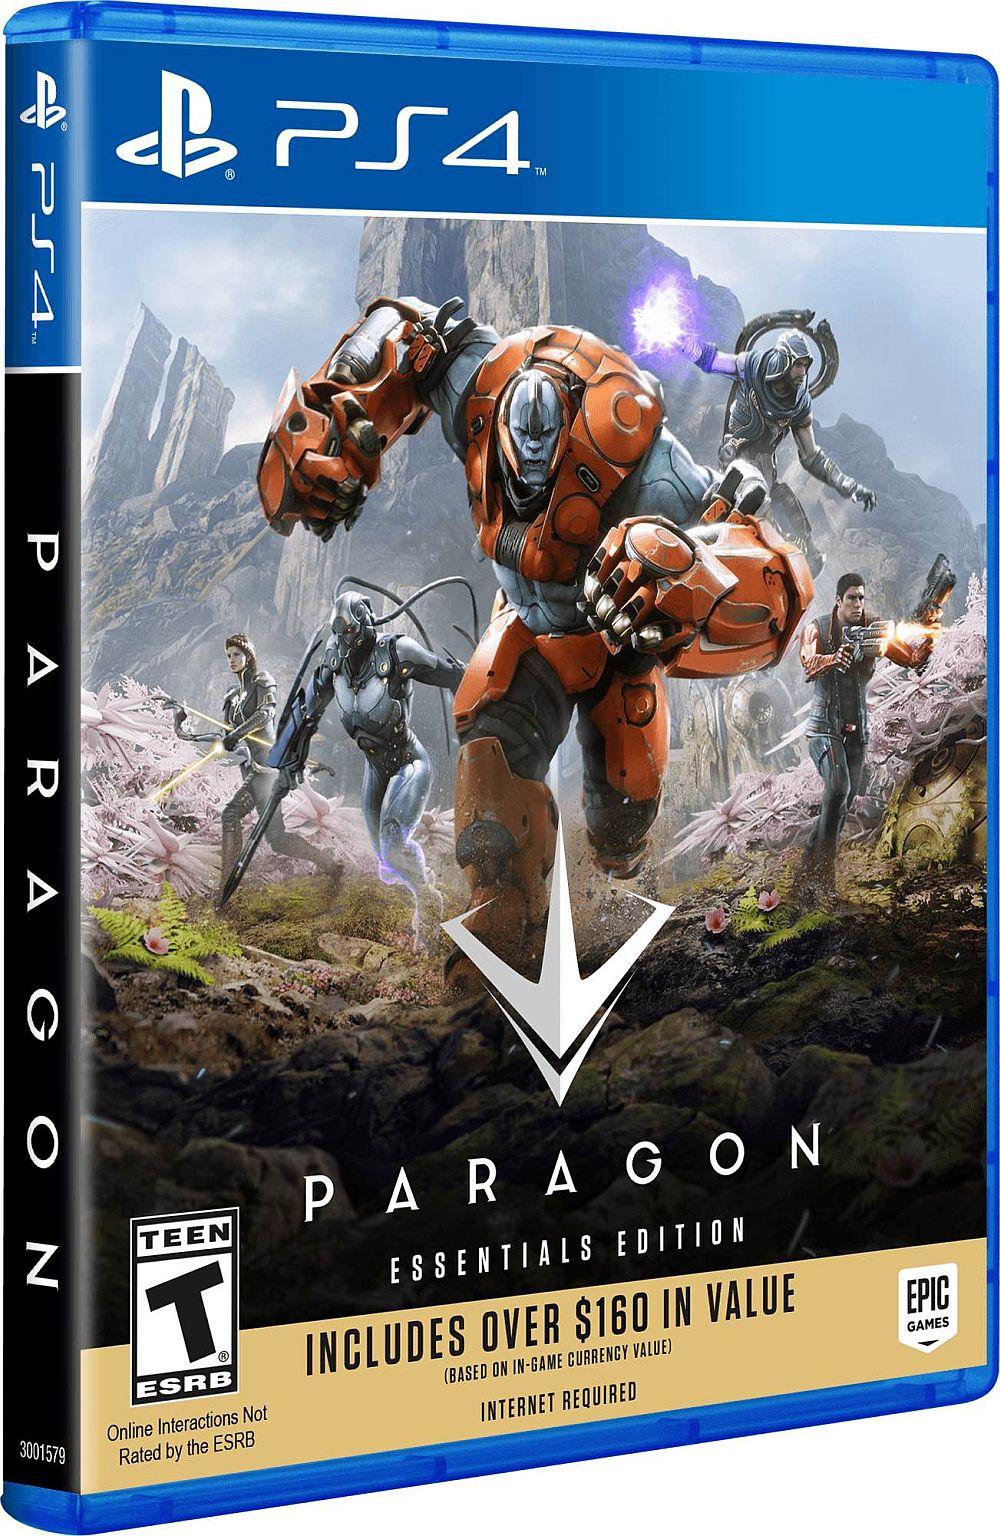 paragon_ps4_essentials_edition